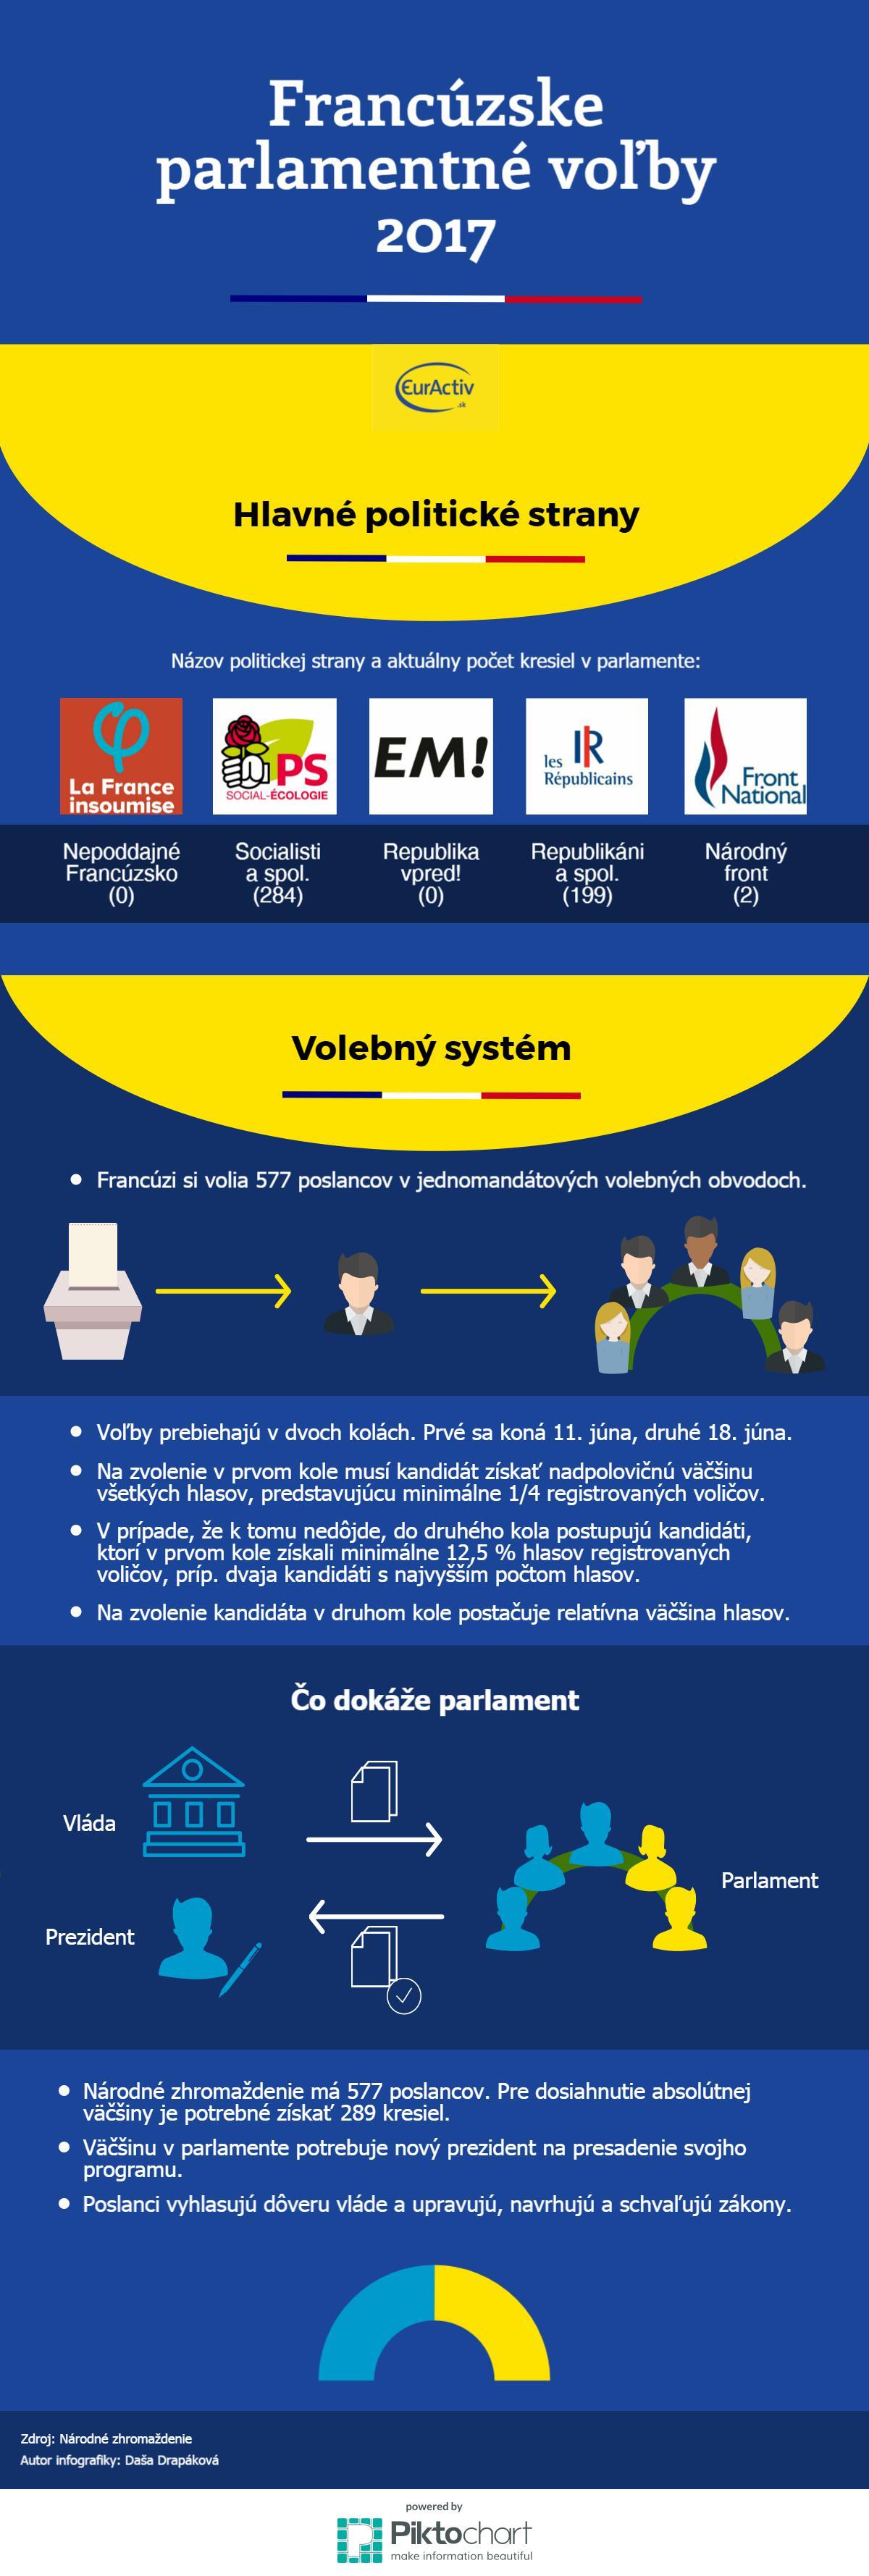 Francuzske volby infografika